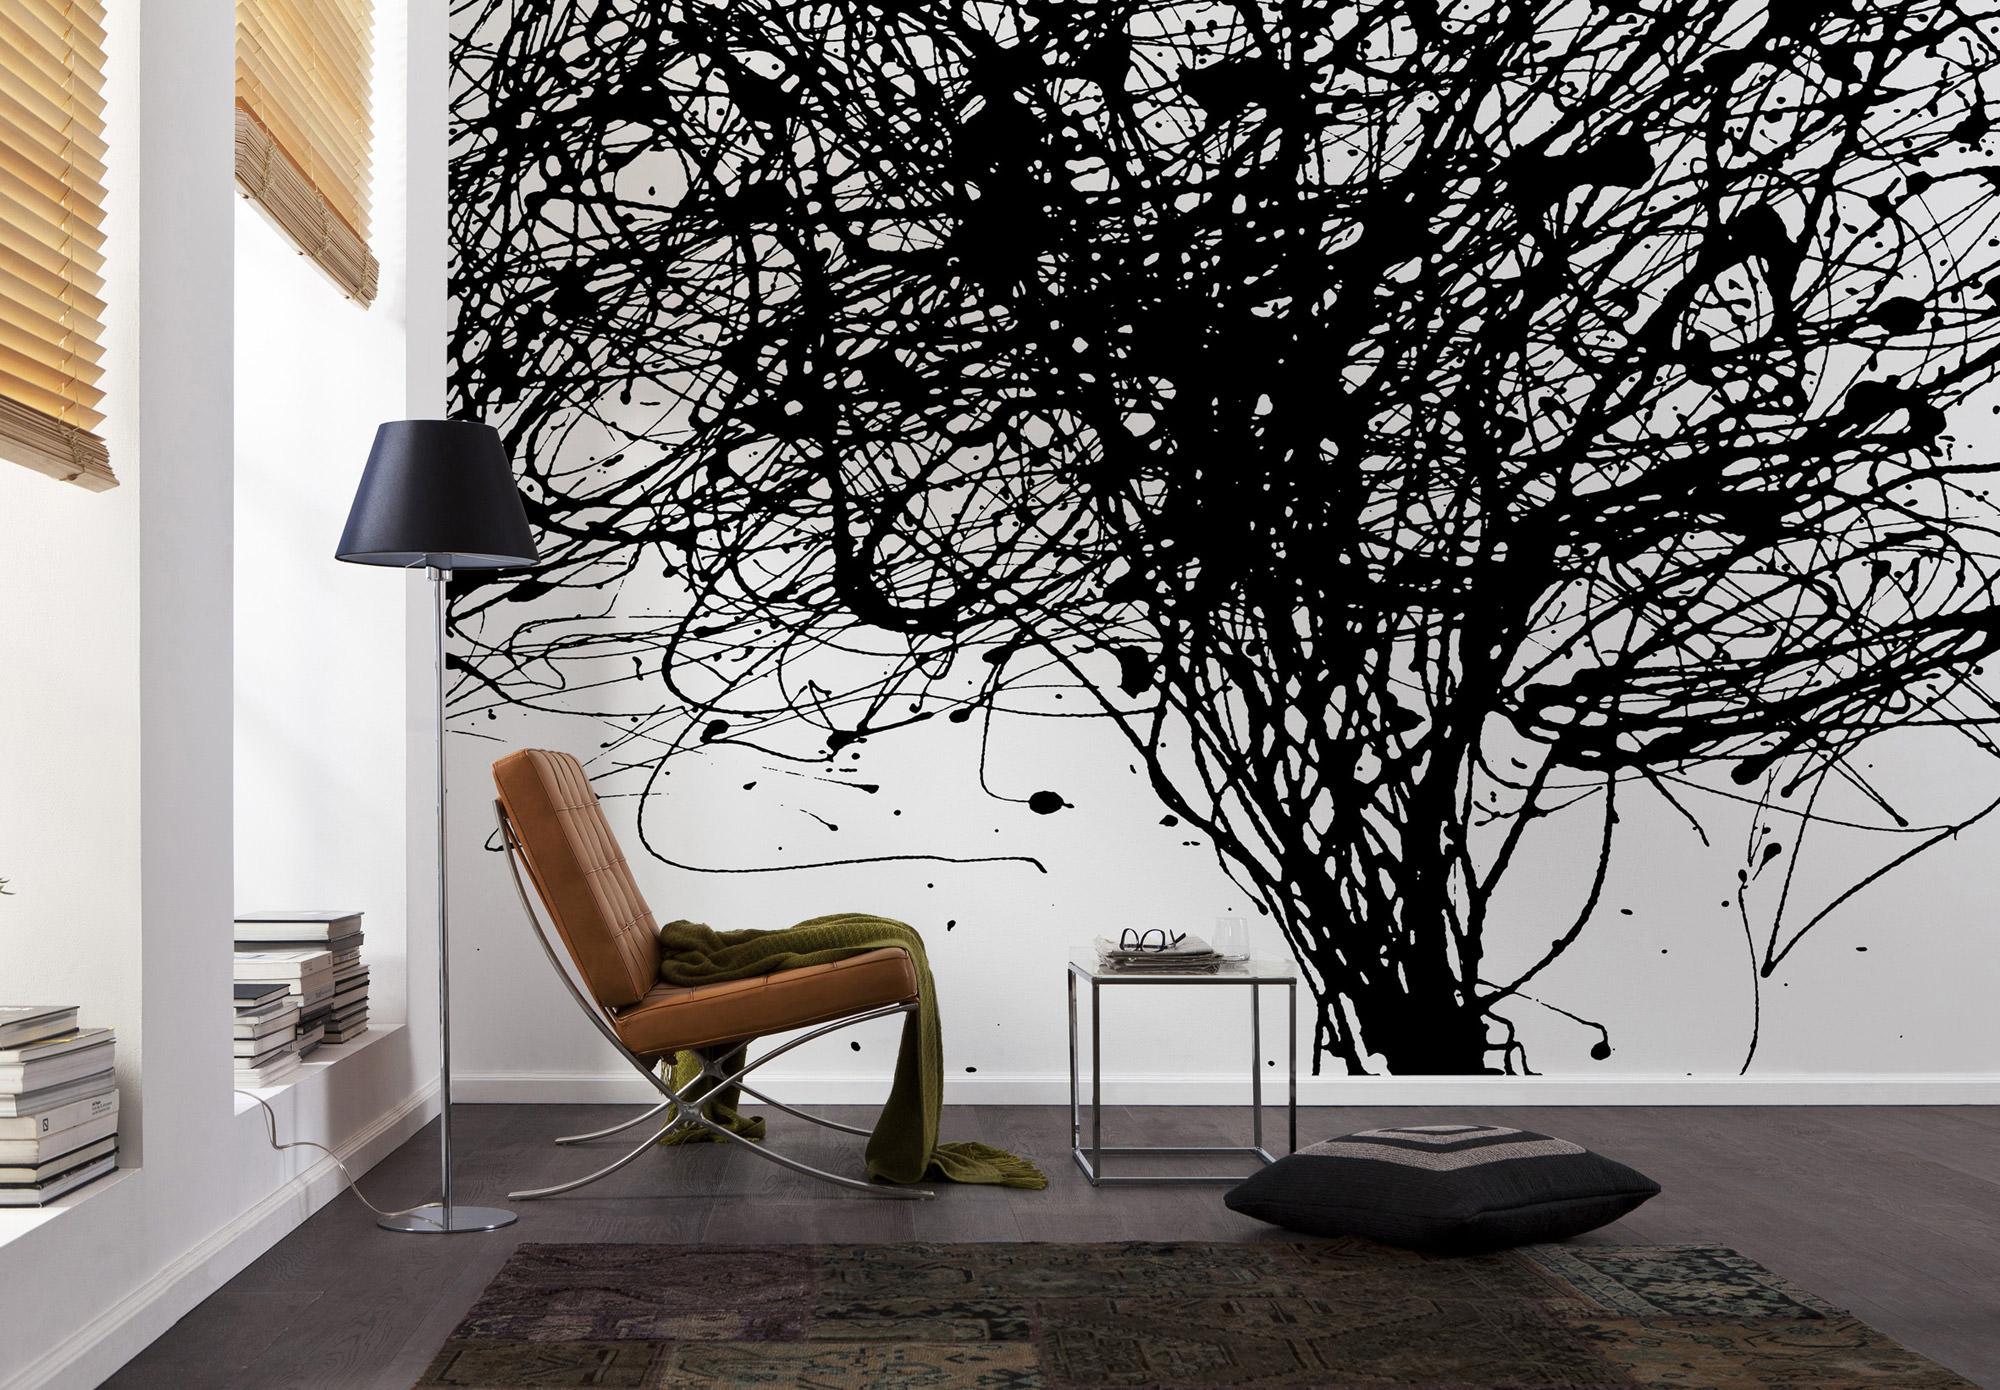 fototapete vlies curls baum tree sunnywall online shop. Black Bedroom Furniture Sets. Home Design Ideas